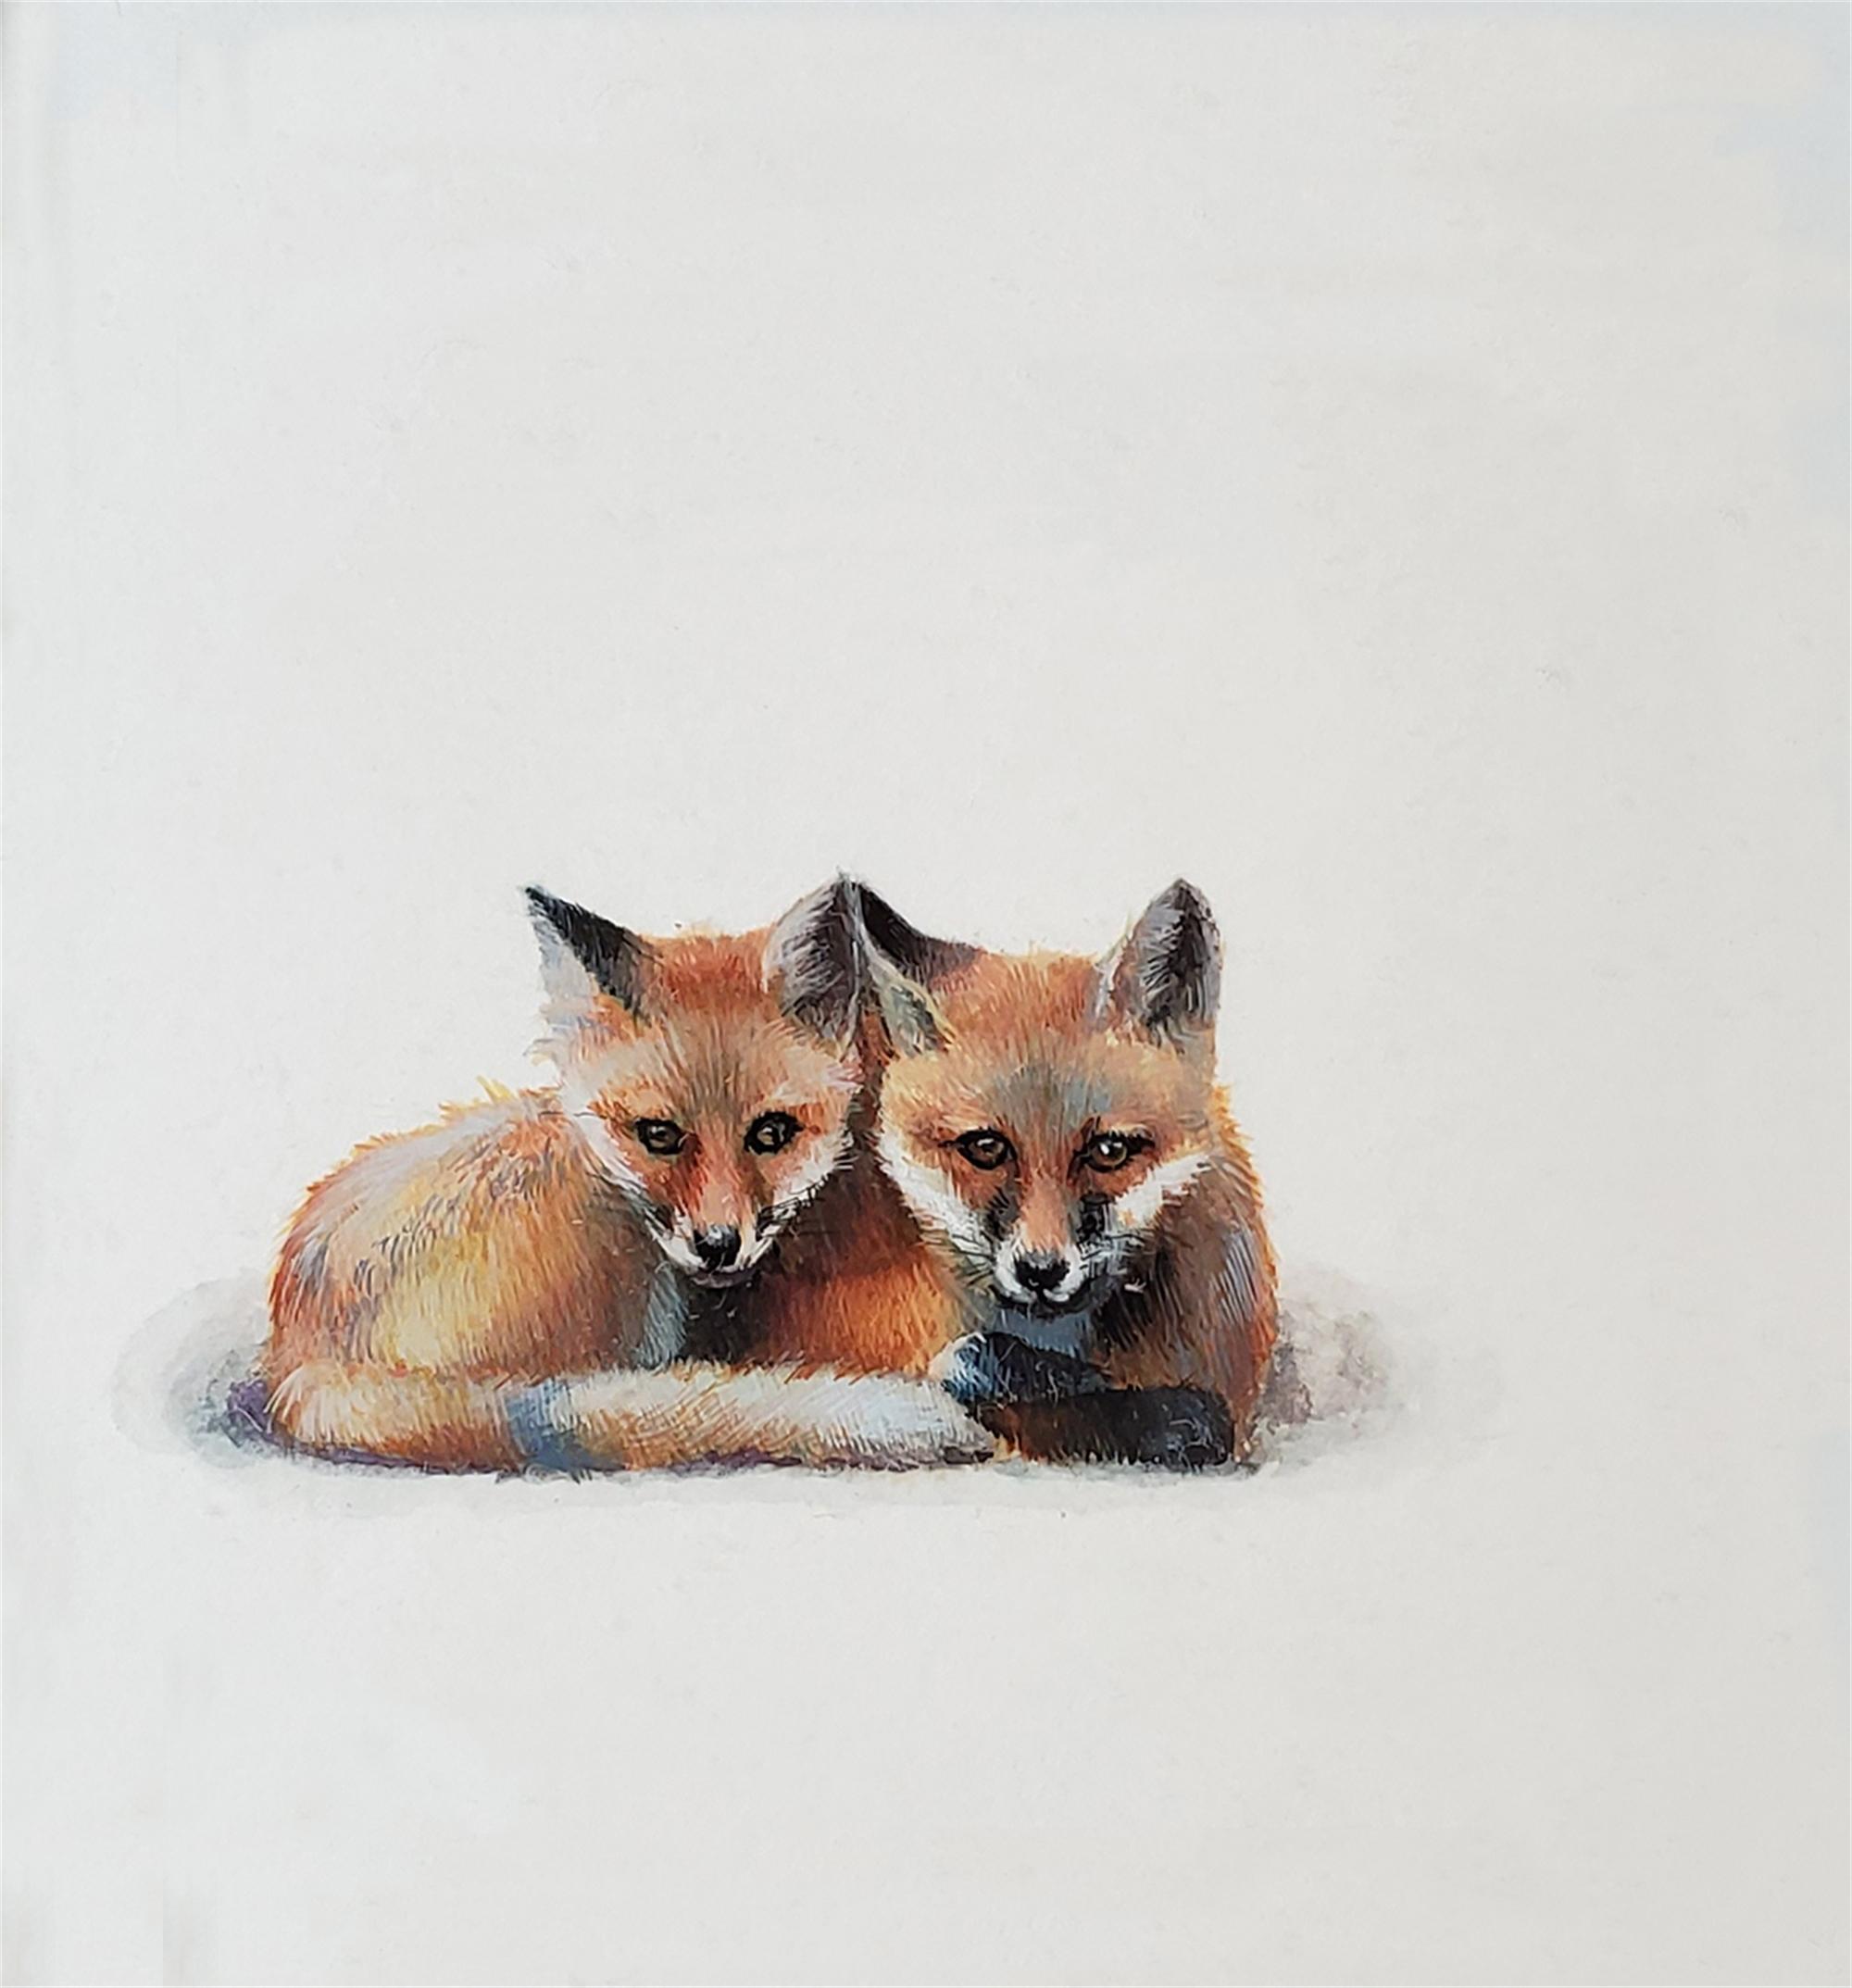 Fox Cubs by Dina Brodsky